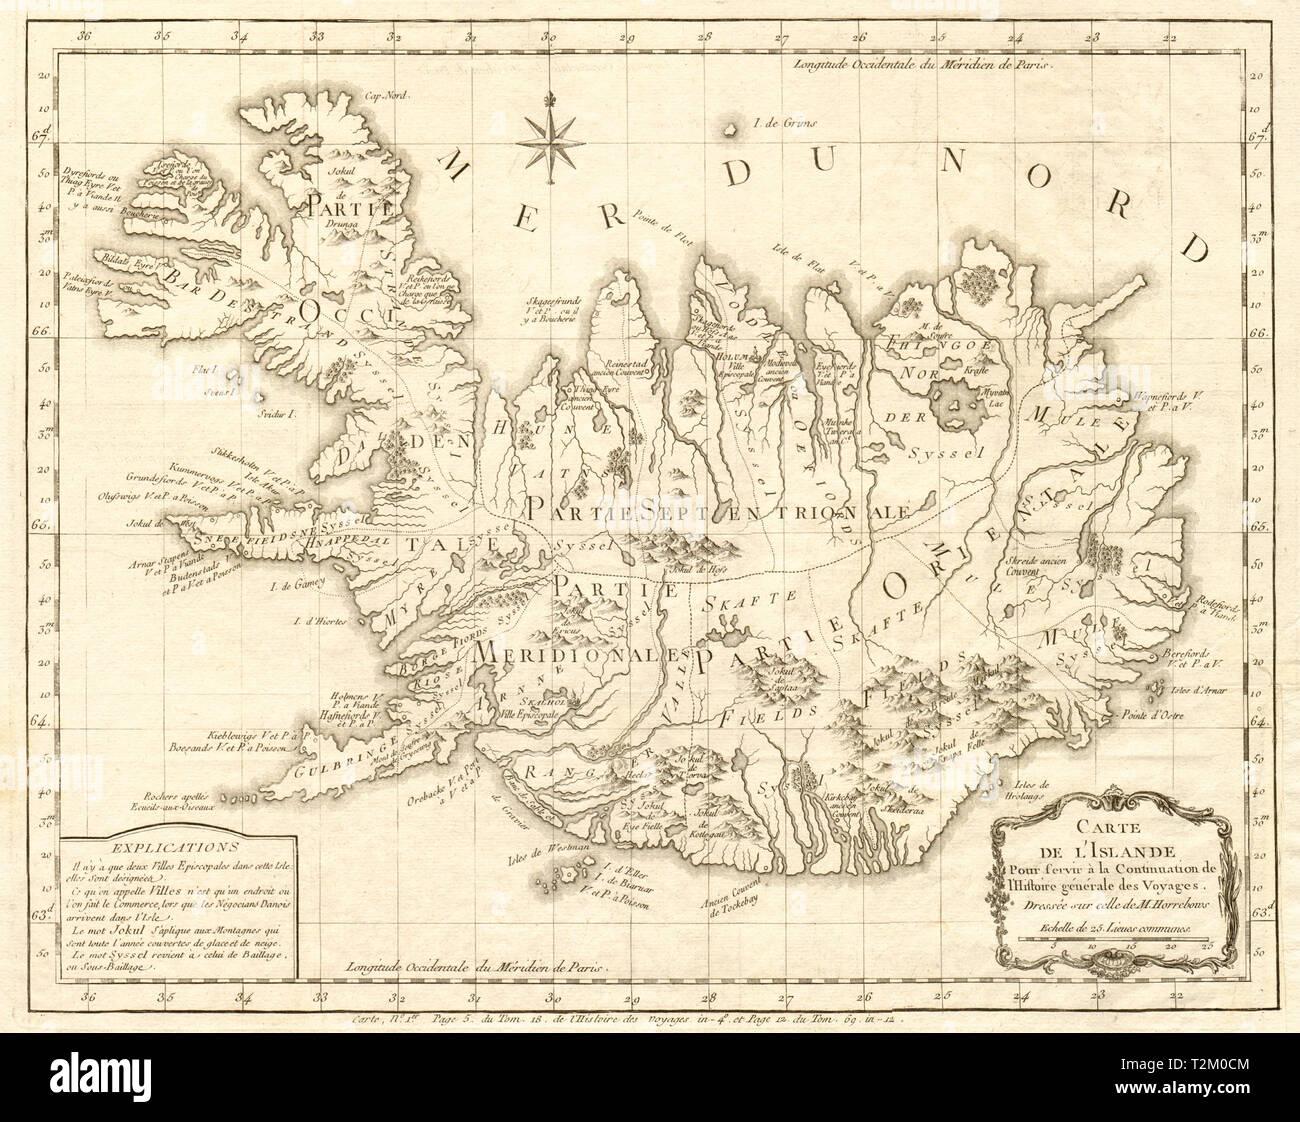 'Carte de l'Islande'. Antique map of Iceland by BELLIN 1768 old - Stock Image